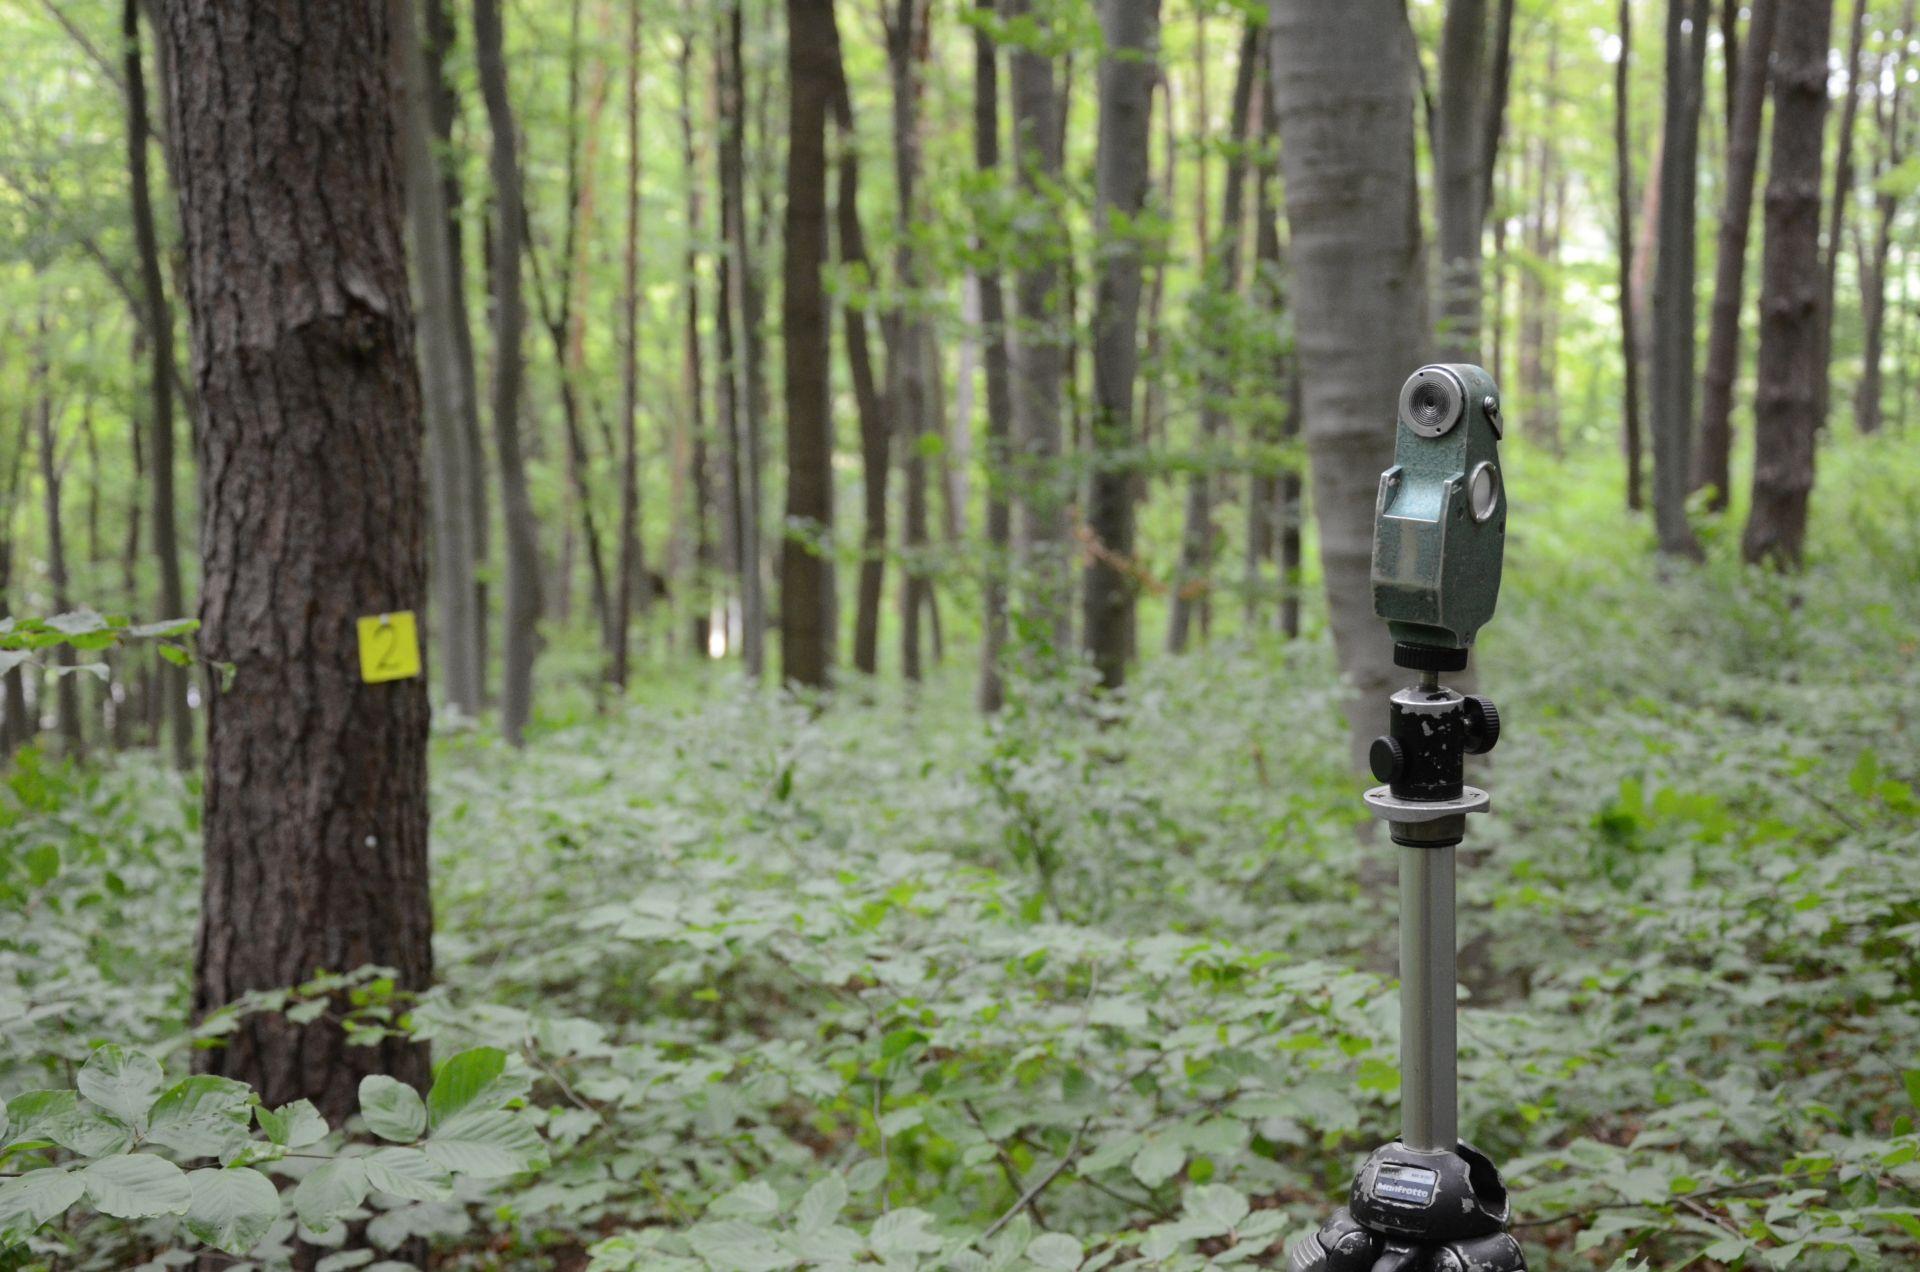 Vermessungsgerät im Wald